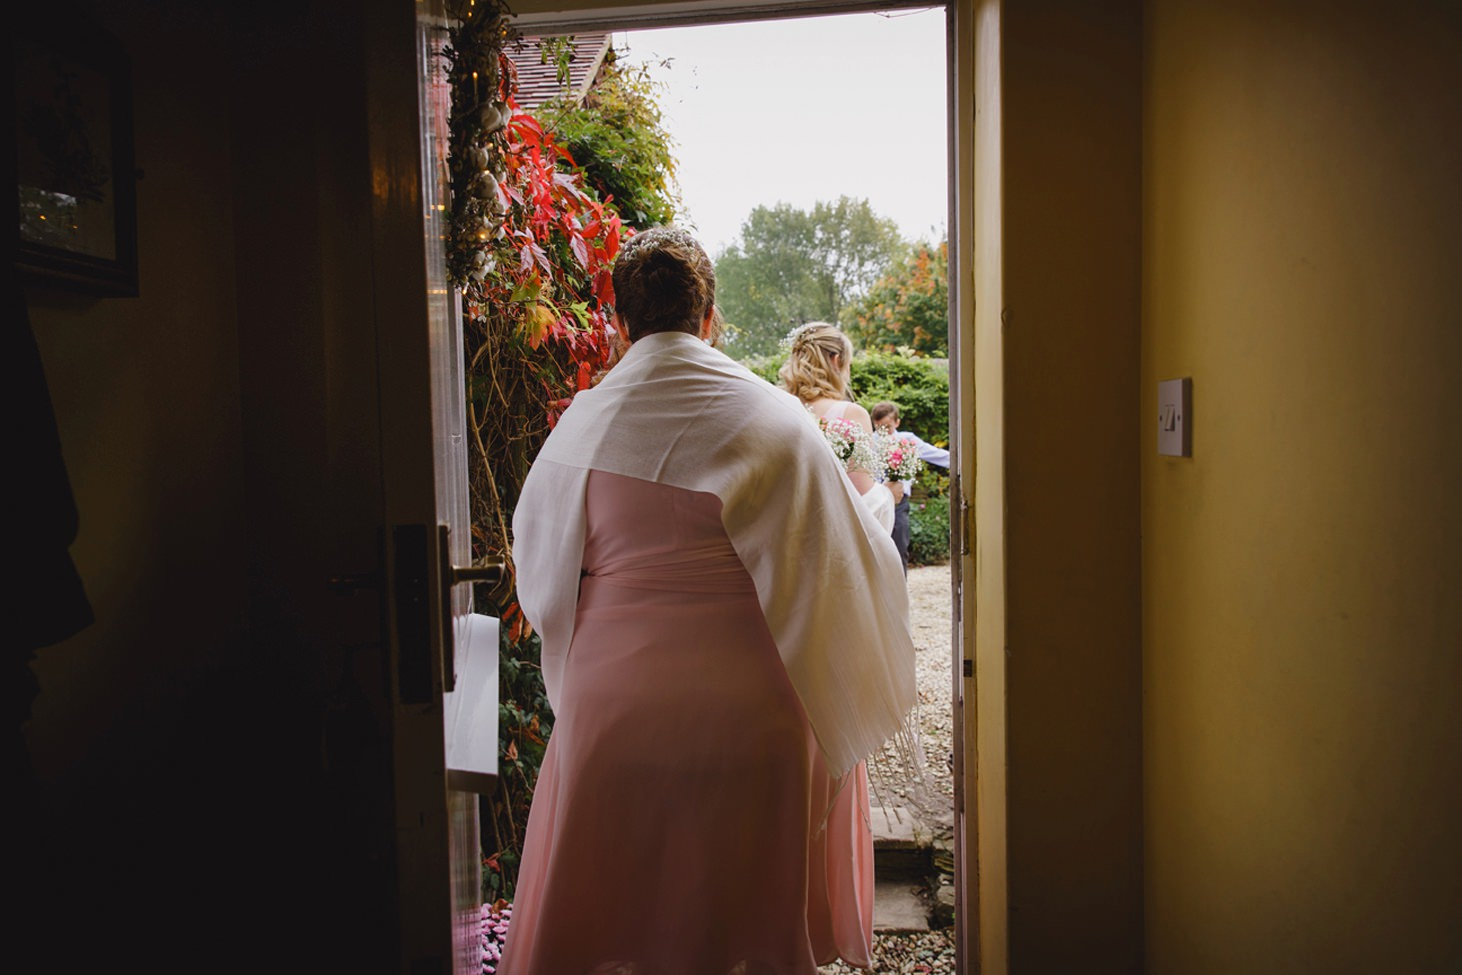 Bodleian library wedding bridesmaid in doorway